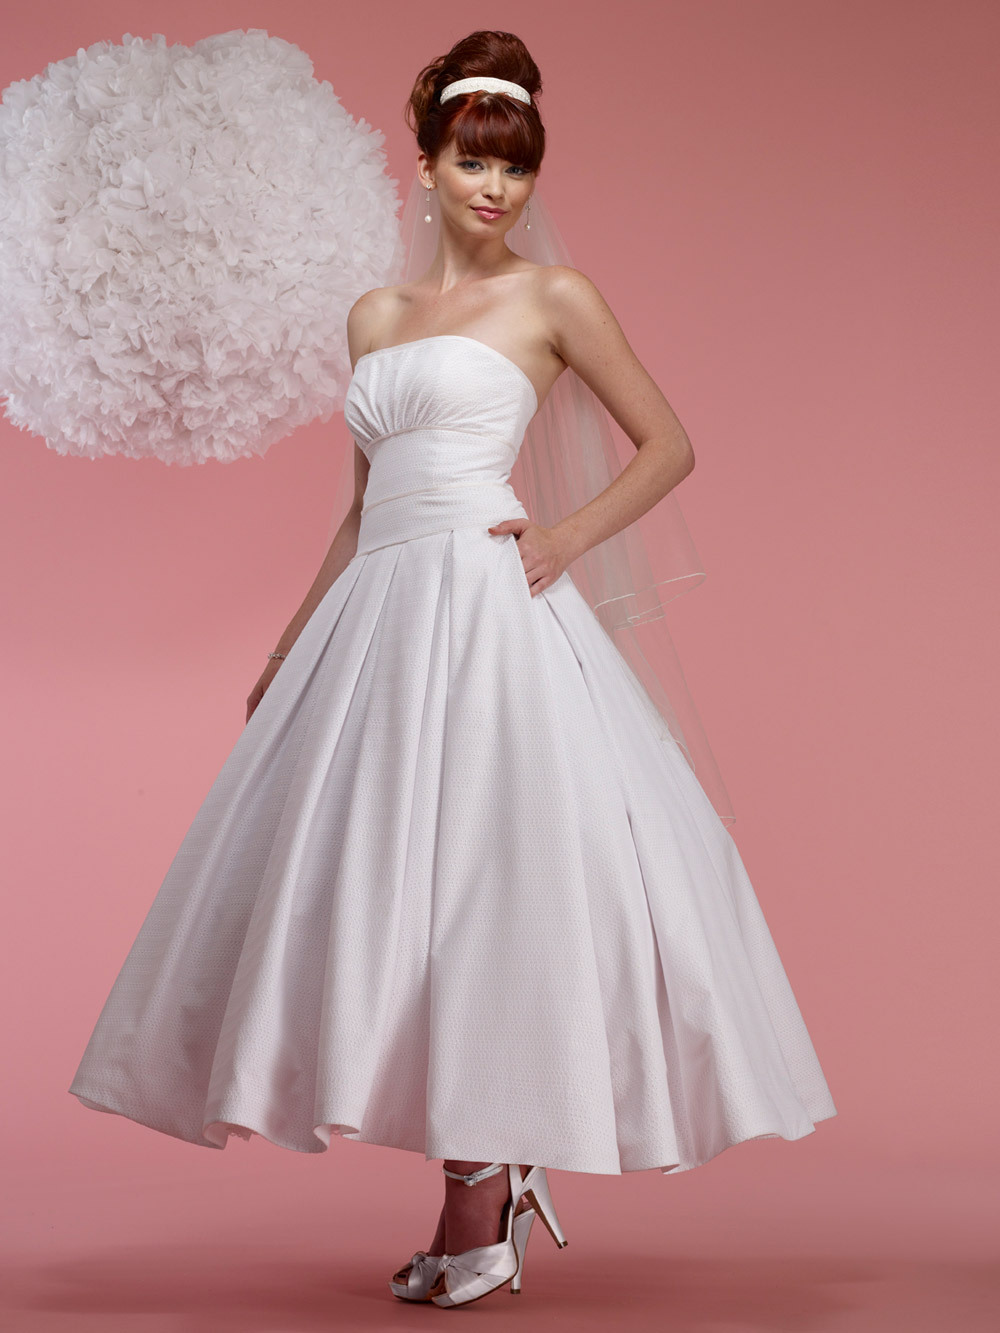 Vintage-inspired-wedding-dress-2012-bridal-gowns-steven-birnbaum-collection-eloise.full